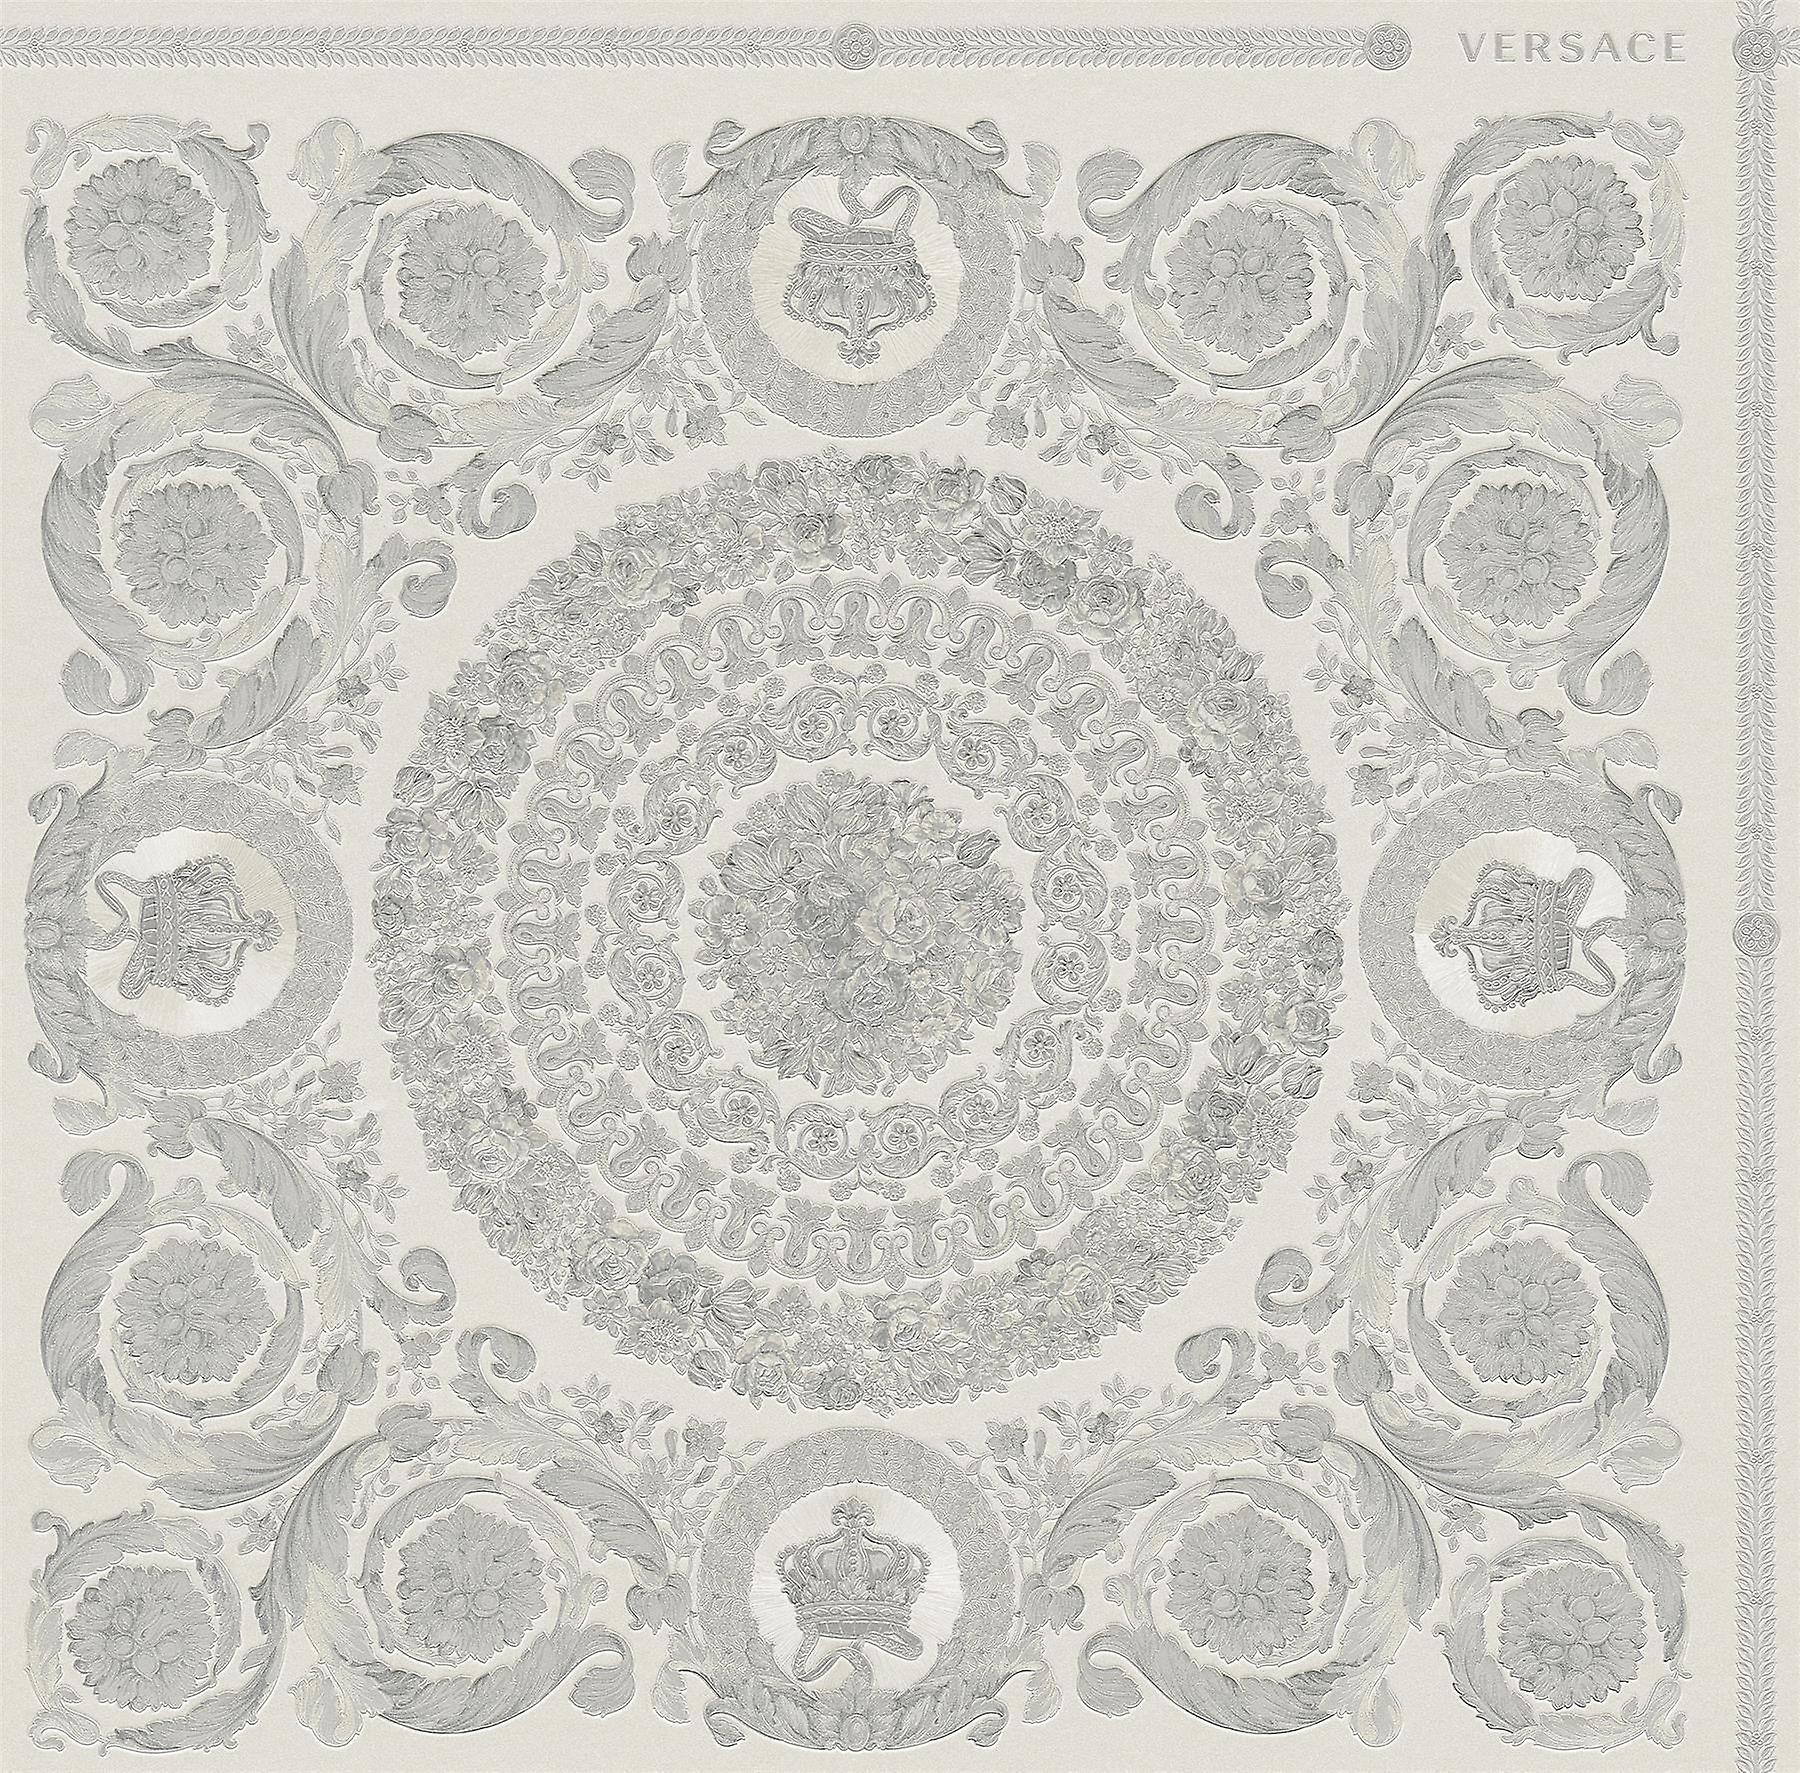 Versace Heritage gris argent Wallpaper Baroque OrnaHommest Metallic Paste Wall